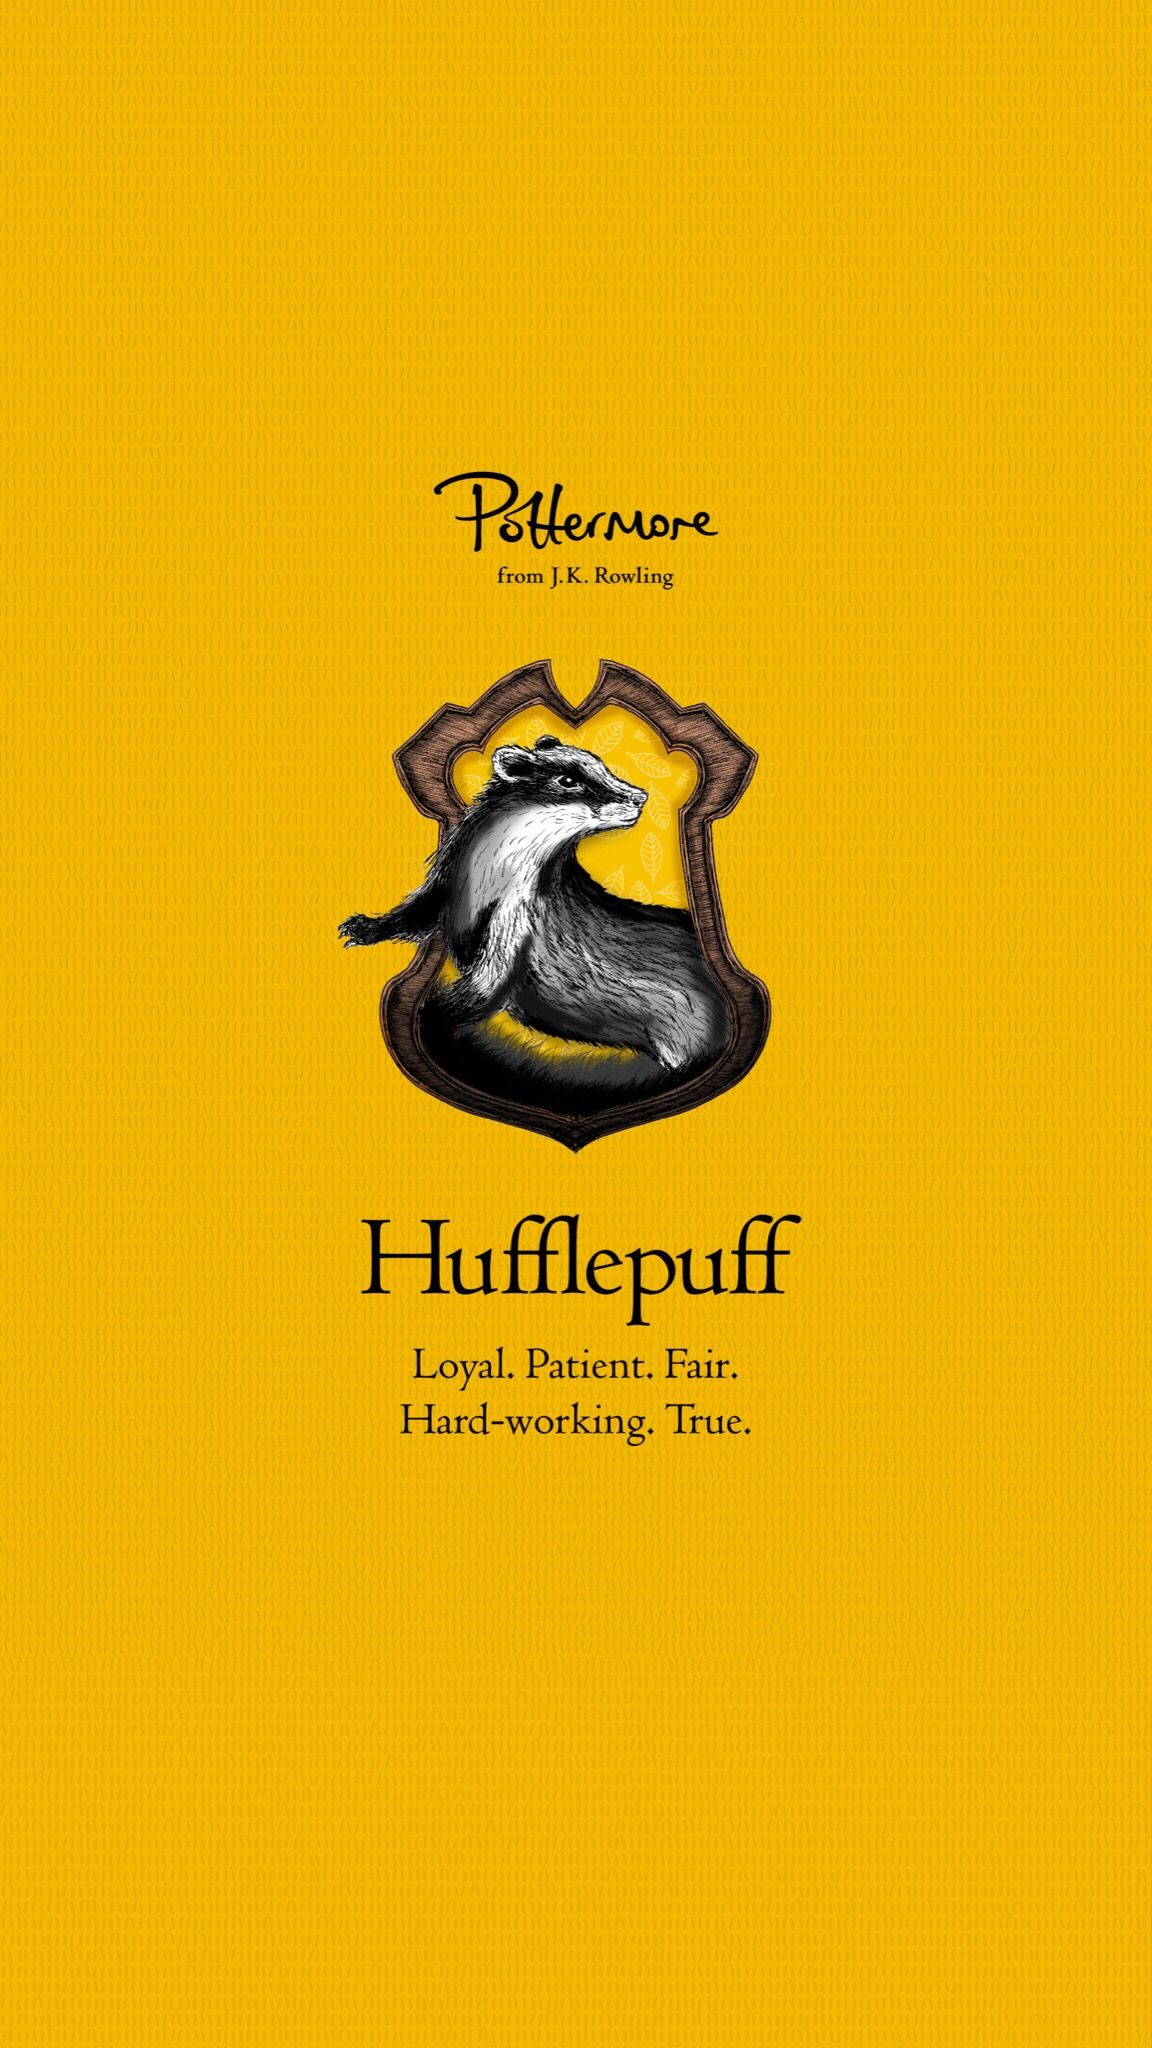 iPhone Hufflepuff Pottermore Wallpaper Harry potter